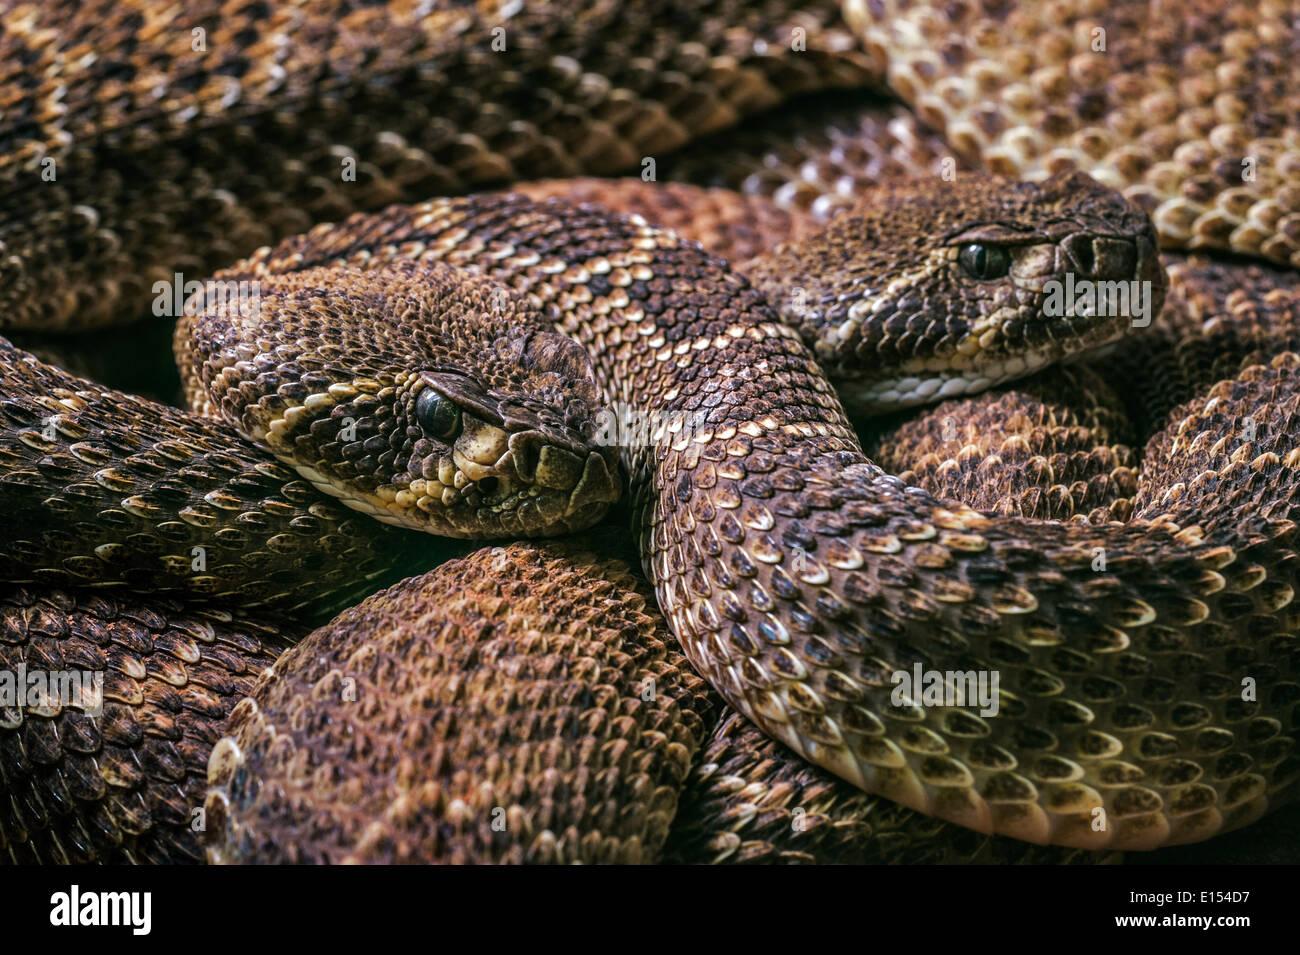 Two Western diamondback rattlesnakes / Texas diamond-back rattlesnake (Crotalus atrox) curled up, United States Stock Photo